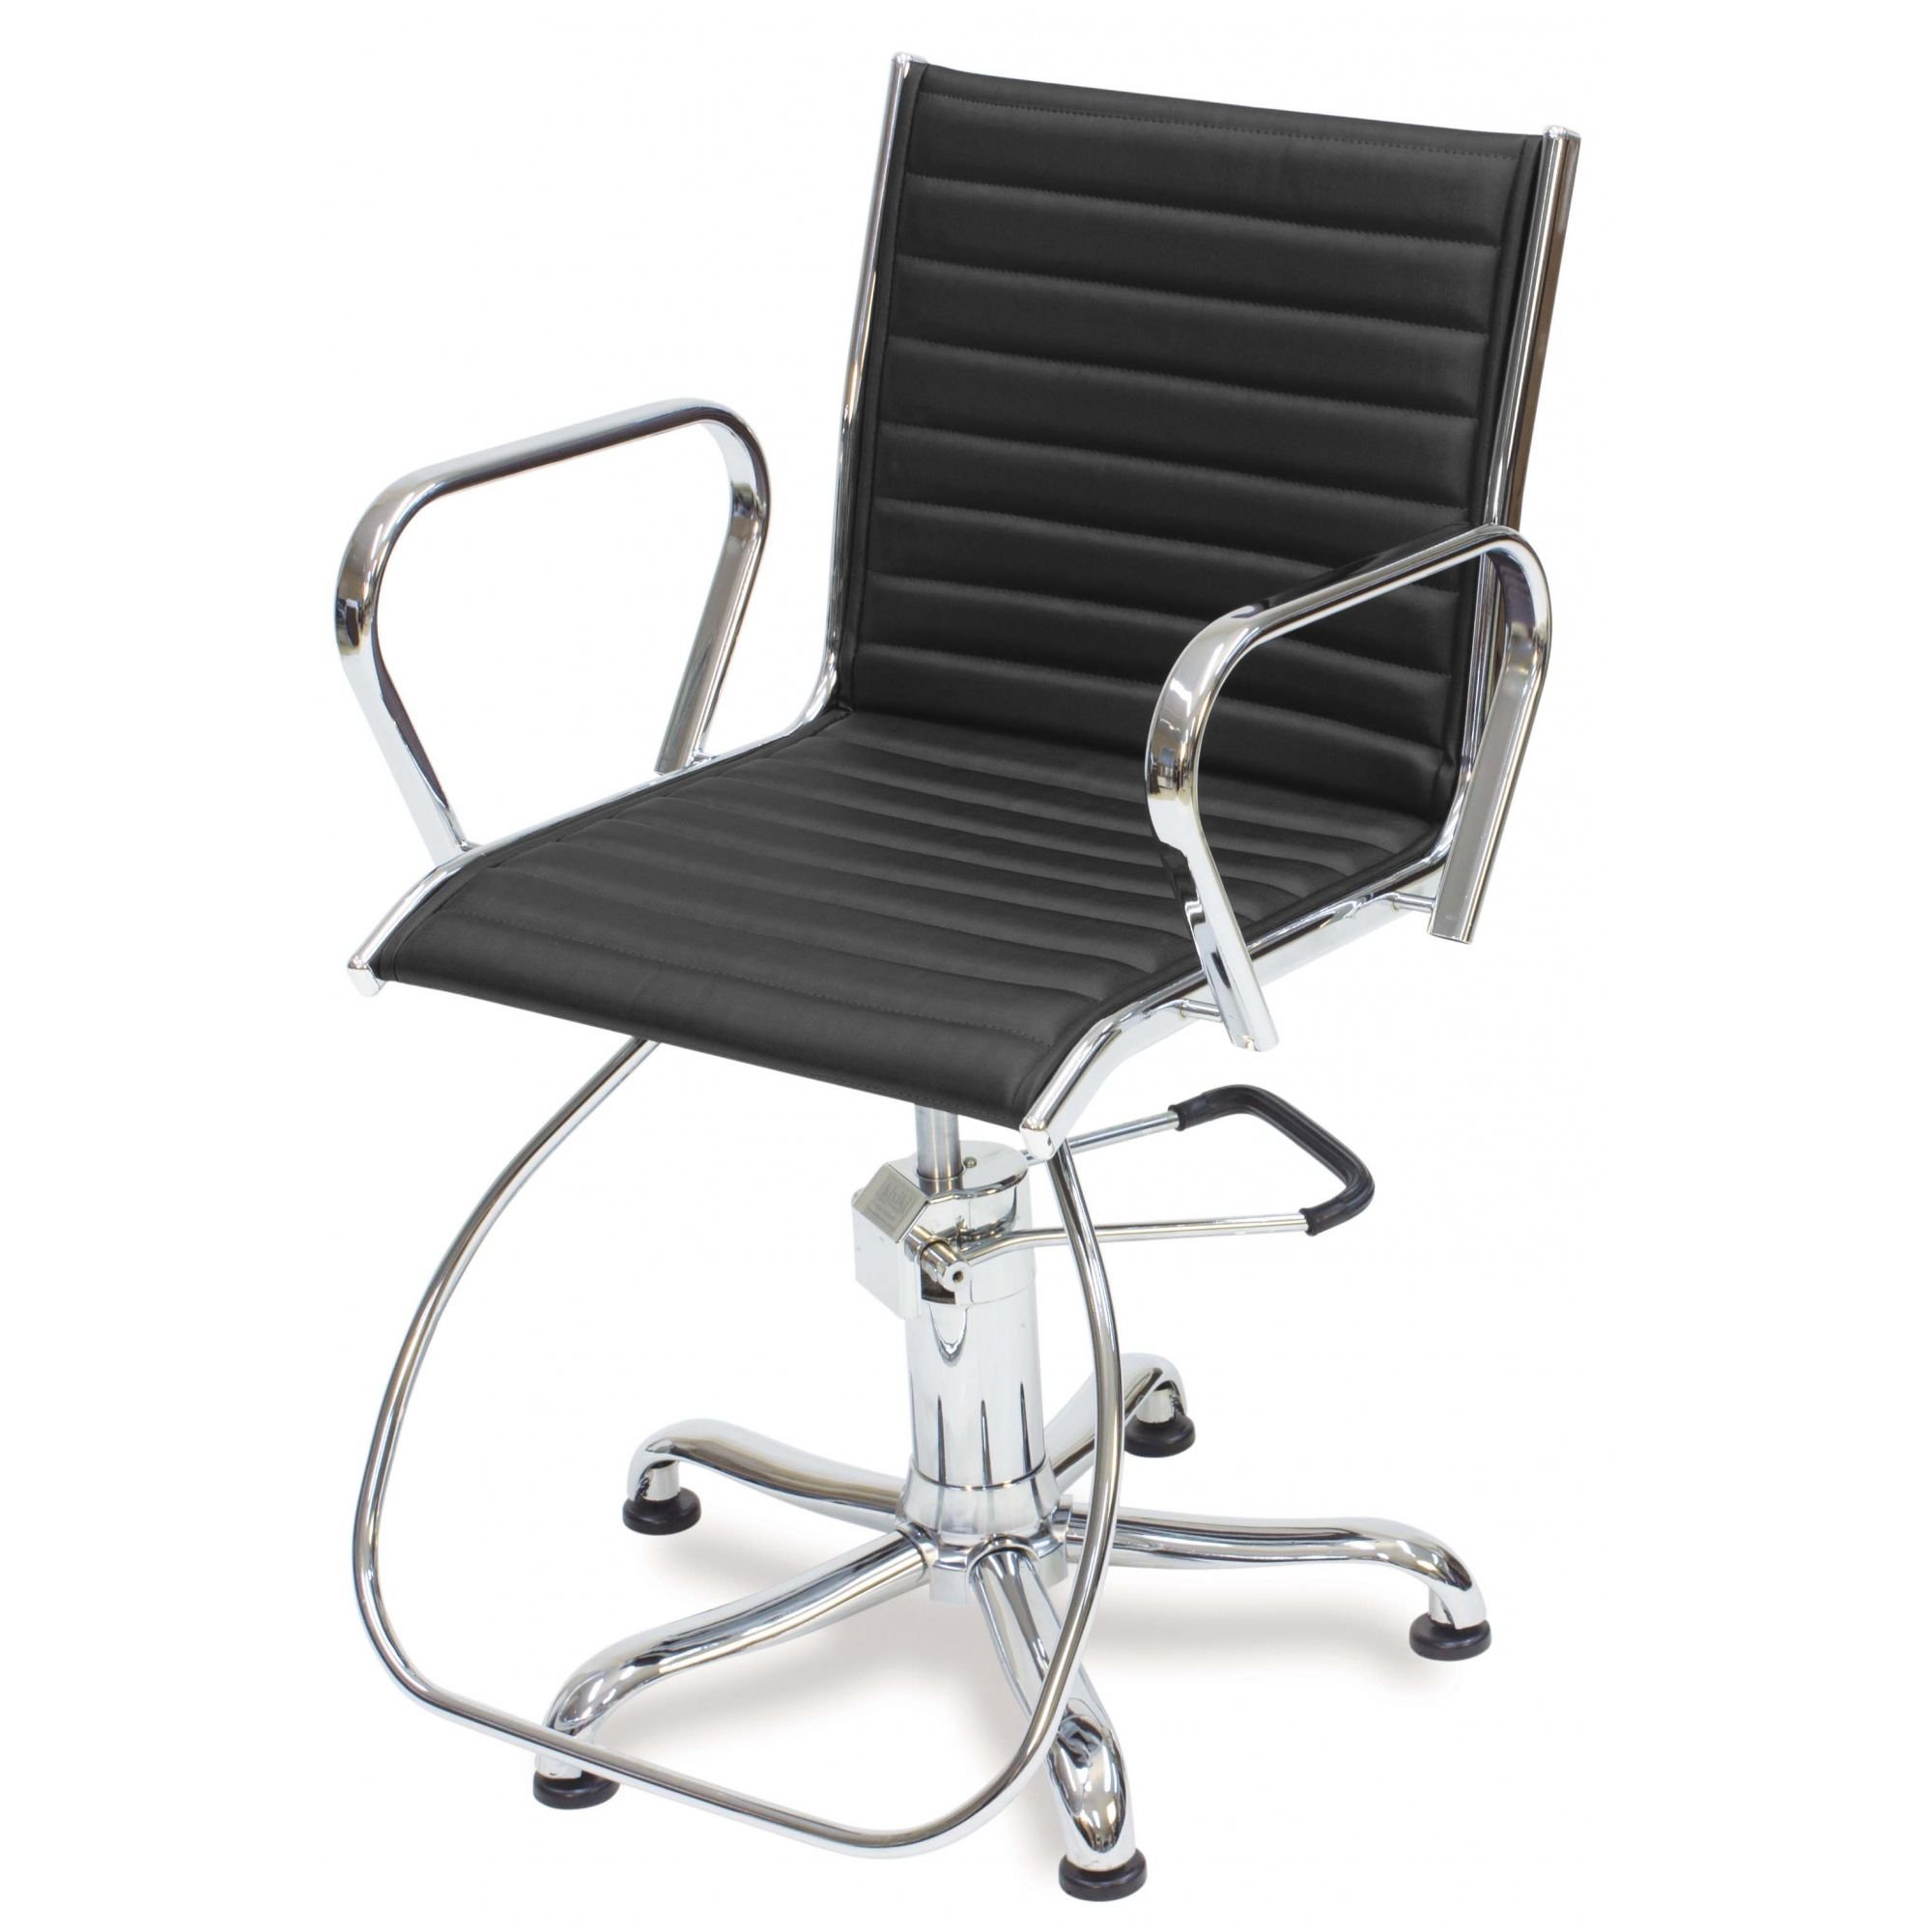 Poltrona Cadeira Kixiki Atenas Fixa Para Cabeleireiro